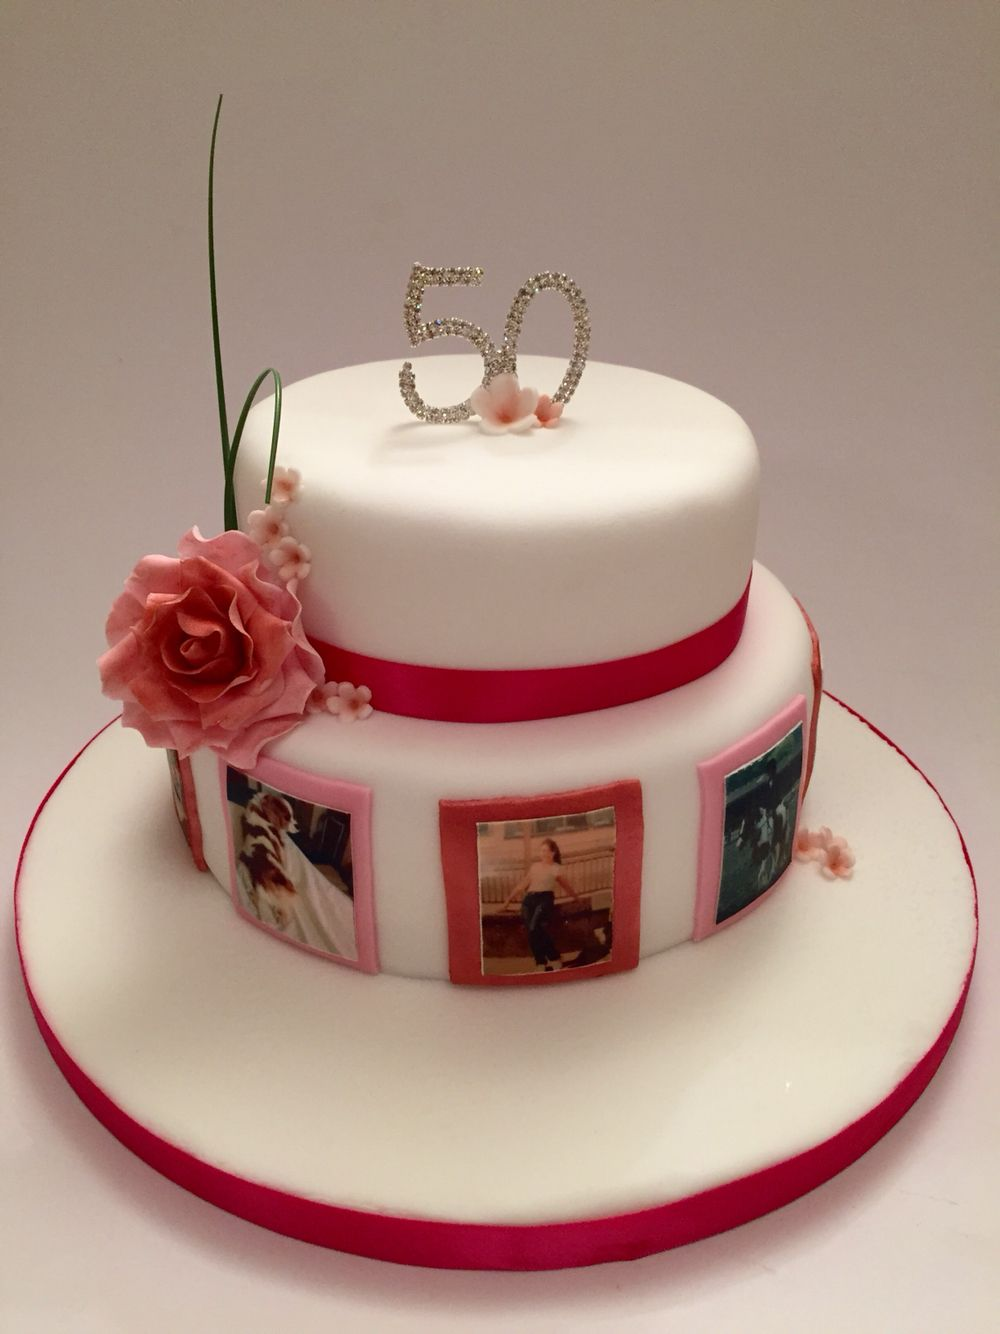 www.lifeissweetcakes.co.uk Female 50th birthday cake